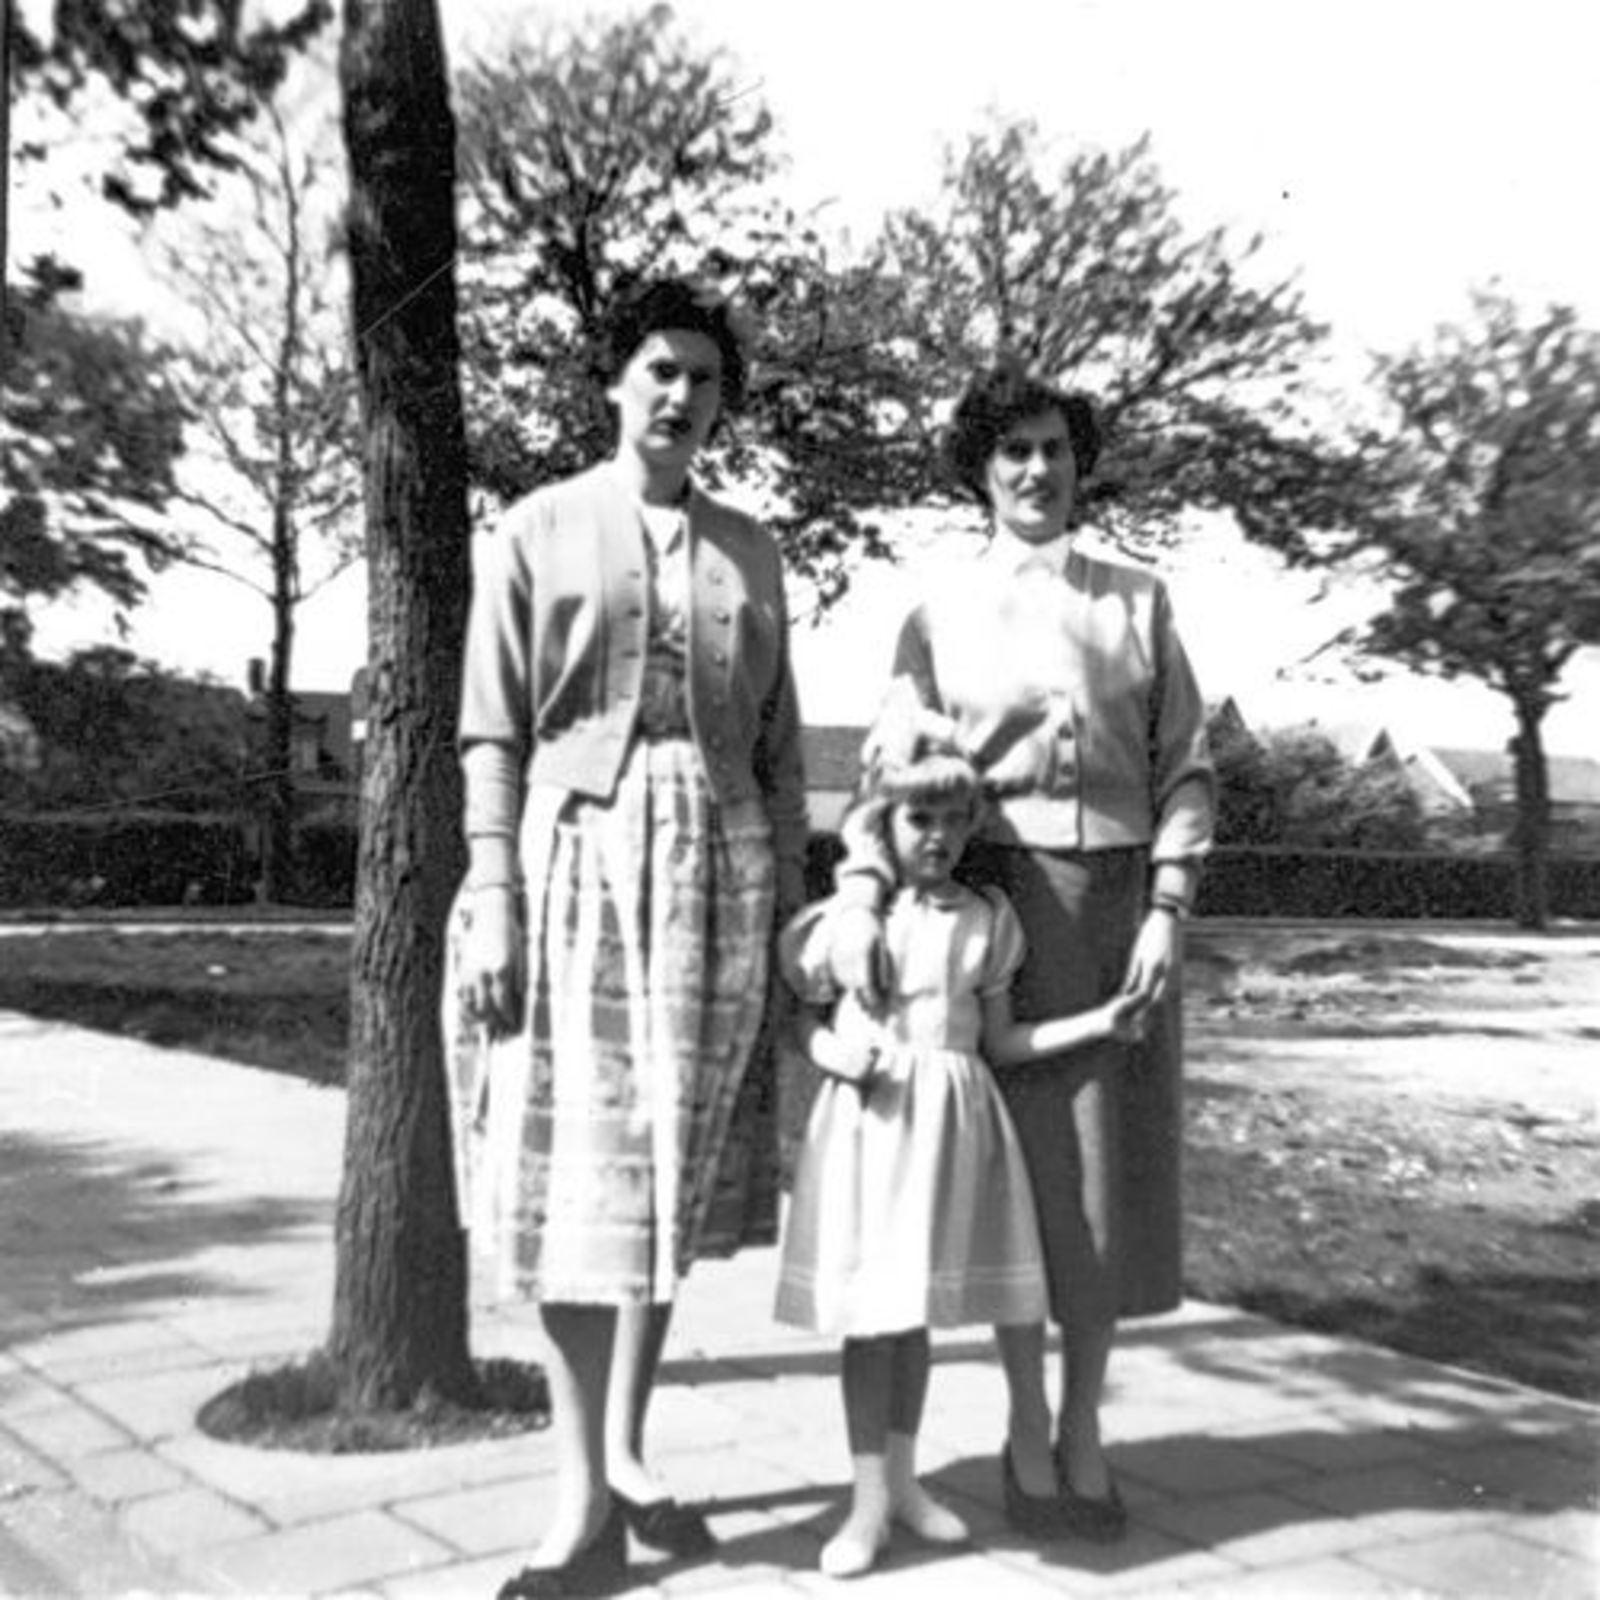 Dam Johanna M 1935 19__ met zus Marijtje in Stationsweg